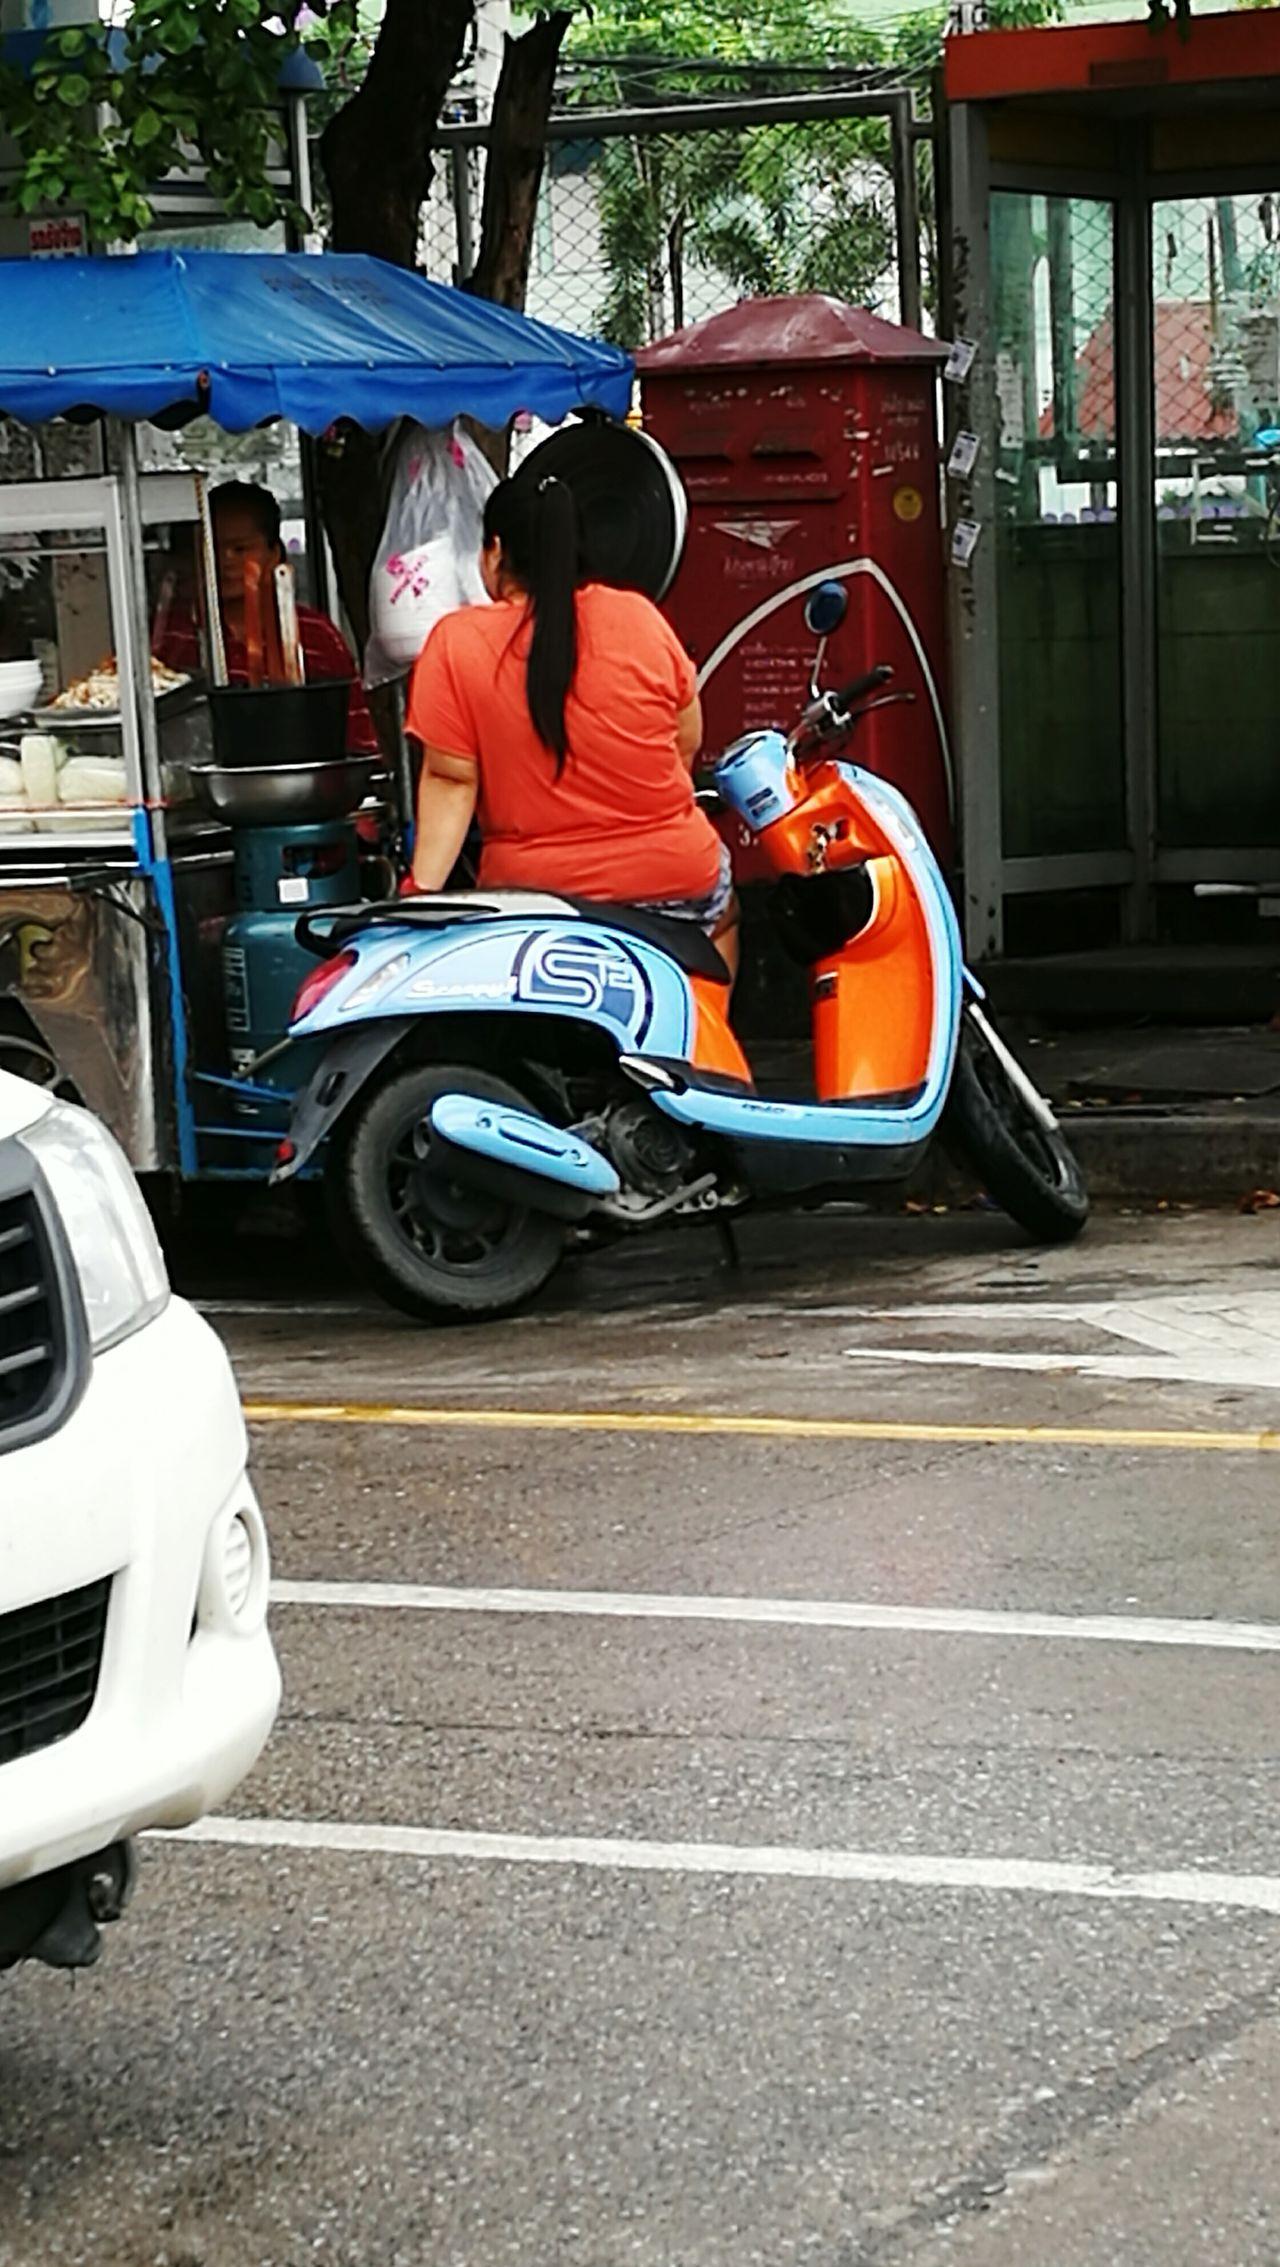 Thaistyle Thailand Thai Food Thai Girl Samut Prakan Bangchalong Street Street Photography Streetfood Woman Obese Woman Obesity